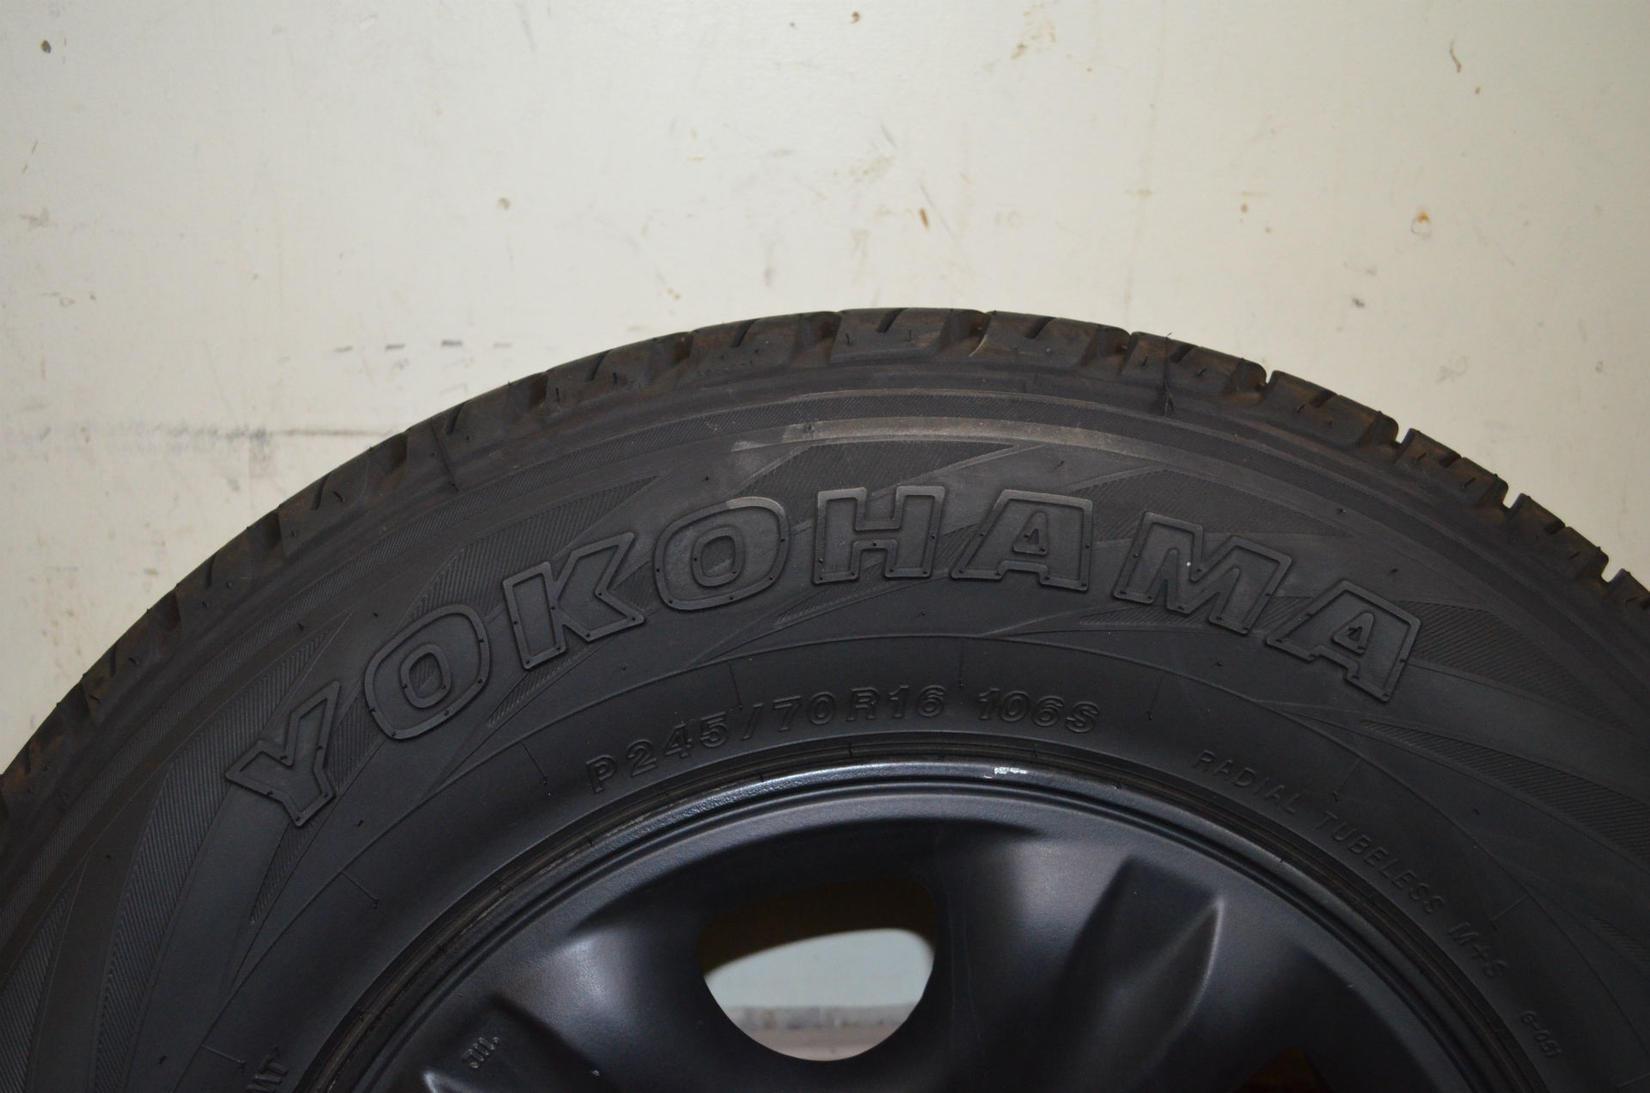 FS in So Cal: Set of Yokohama Geolandar H/T-S 245/70R16 on 3rd Gen 4R Wheels- 0-yoko-2-small-jpg